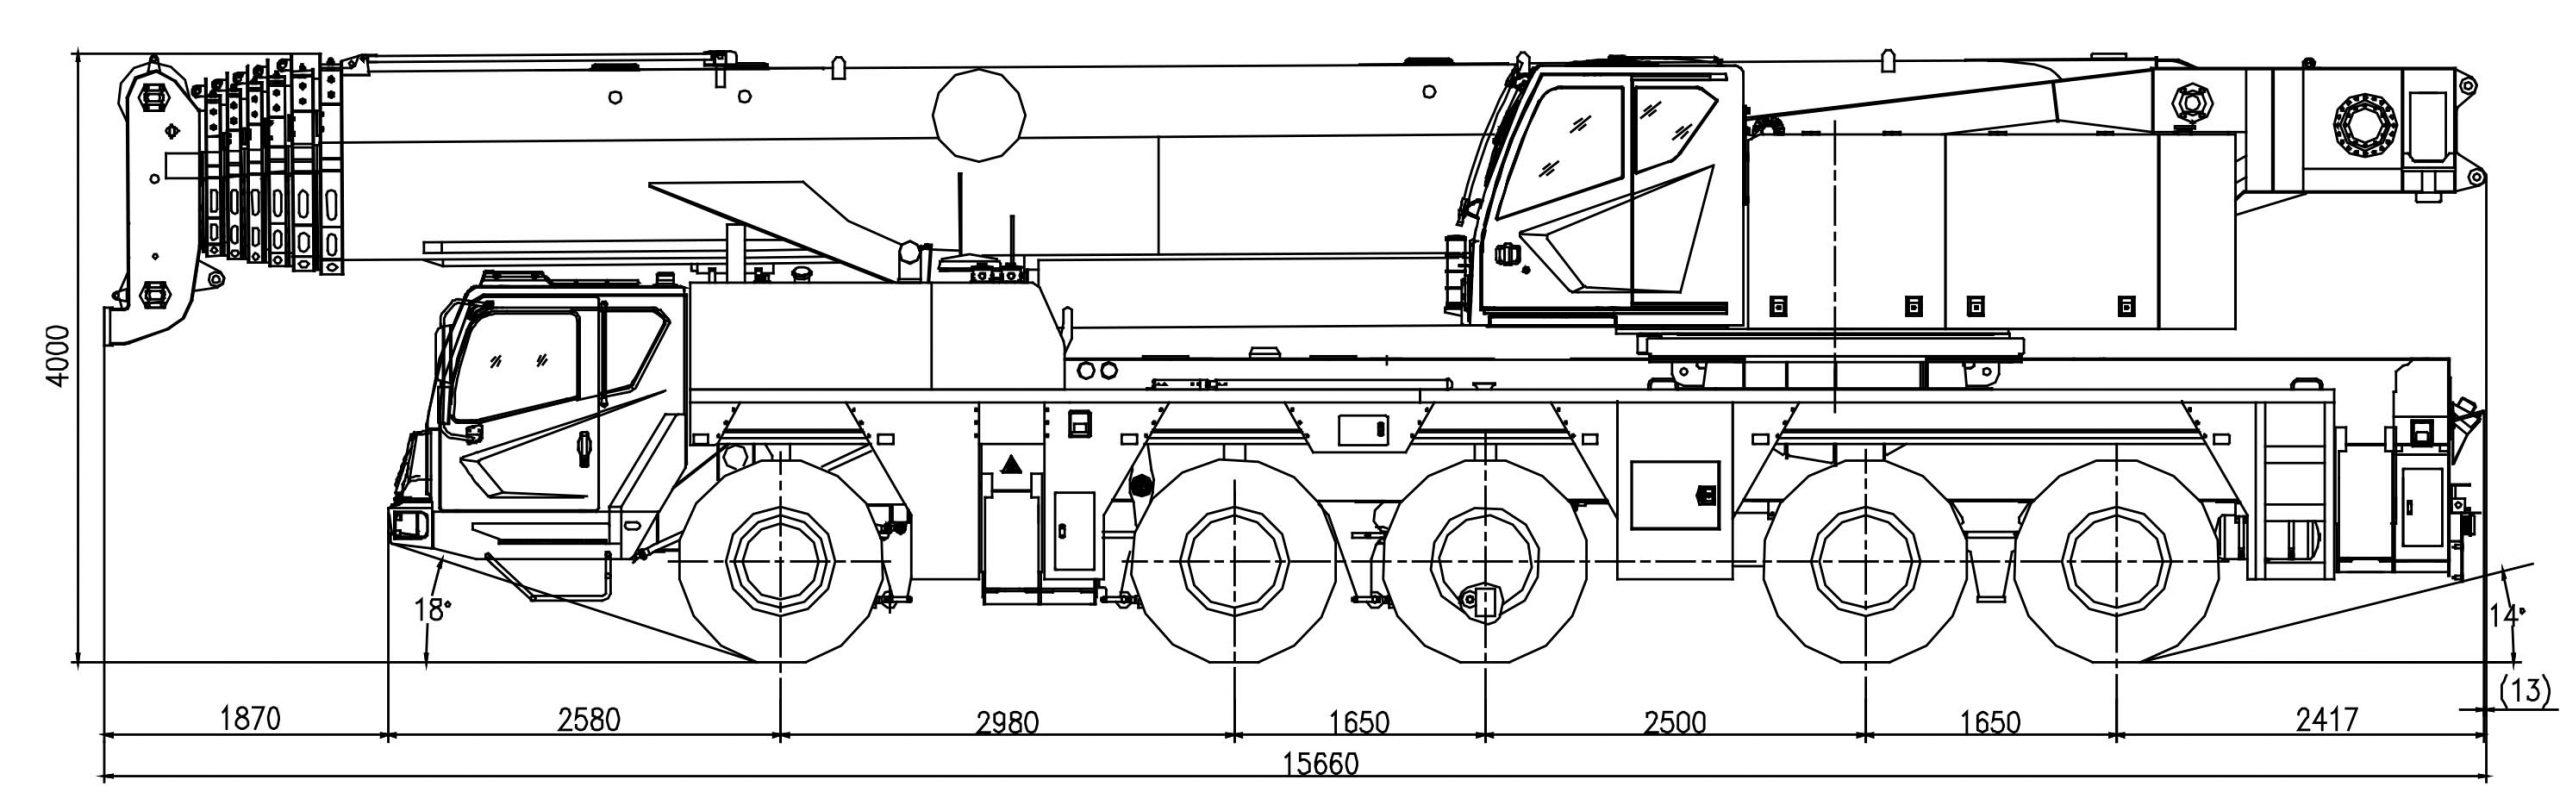 Размеры полноприводного крана ZAT2000 Zoomlion